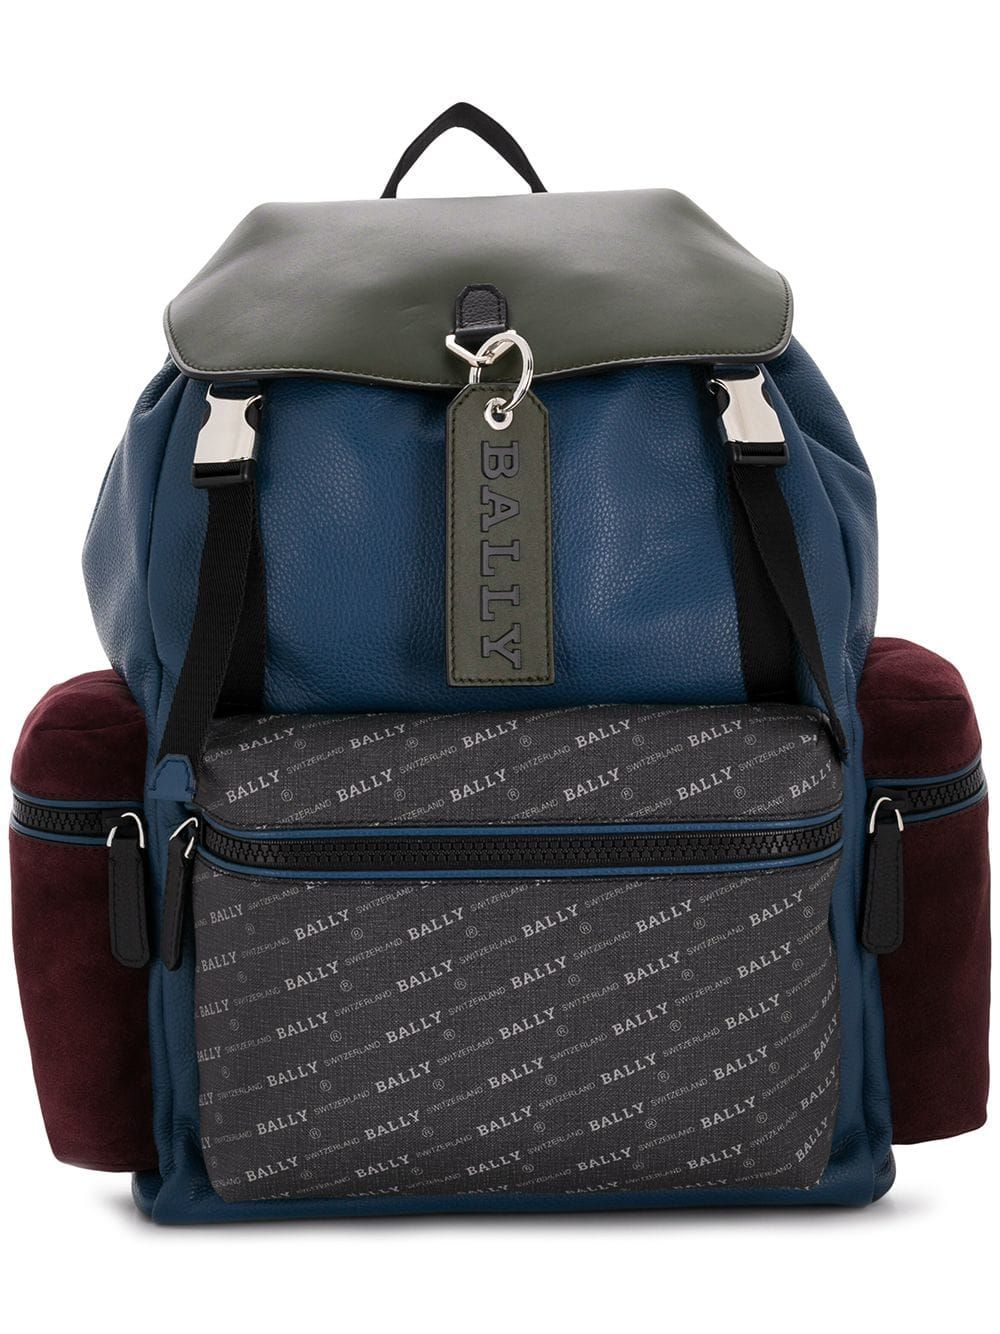 1284c37f0e BALLY BALLY CREW BACKPACK - BLUE.  bally  bags  leather  backpacks ...